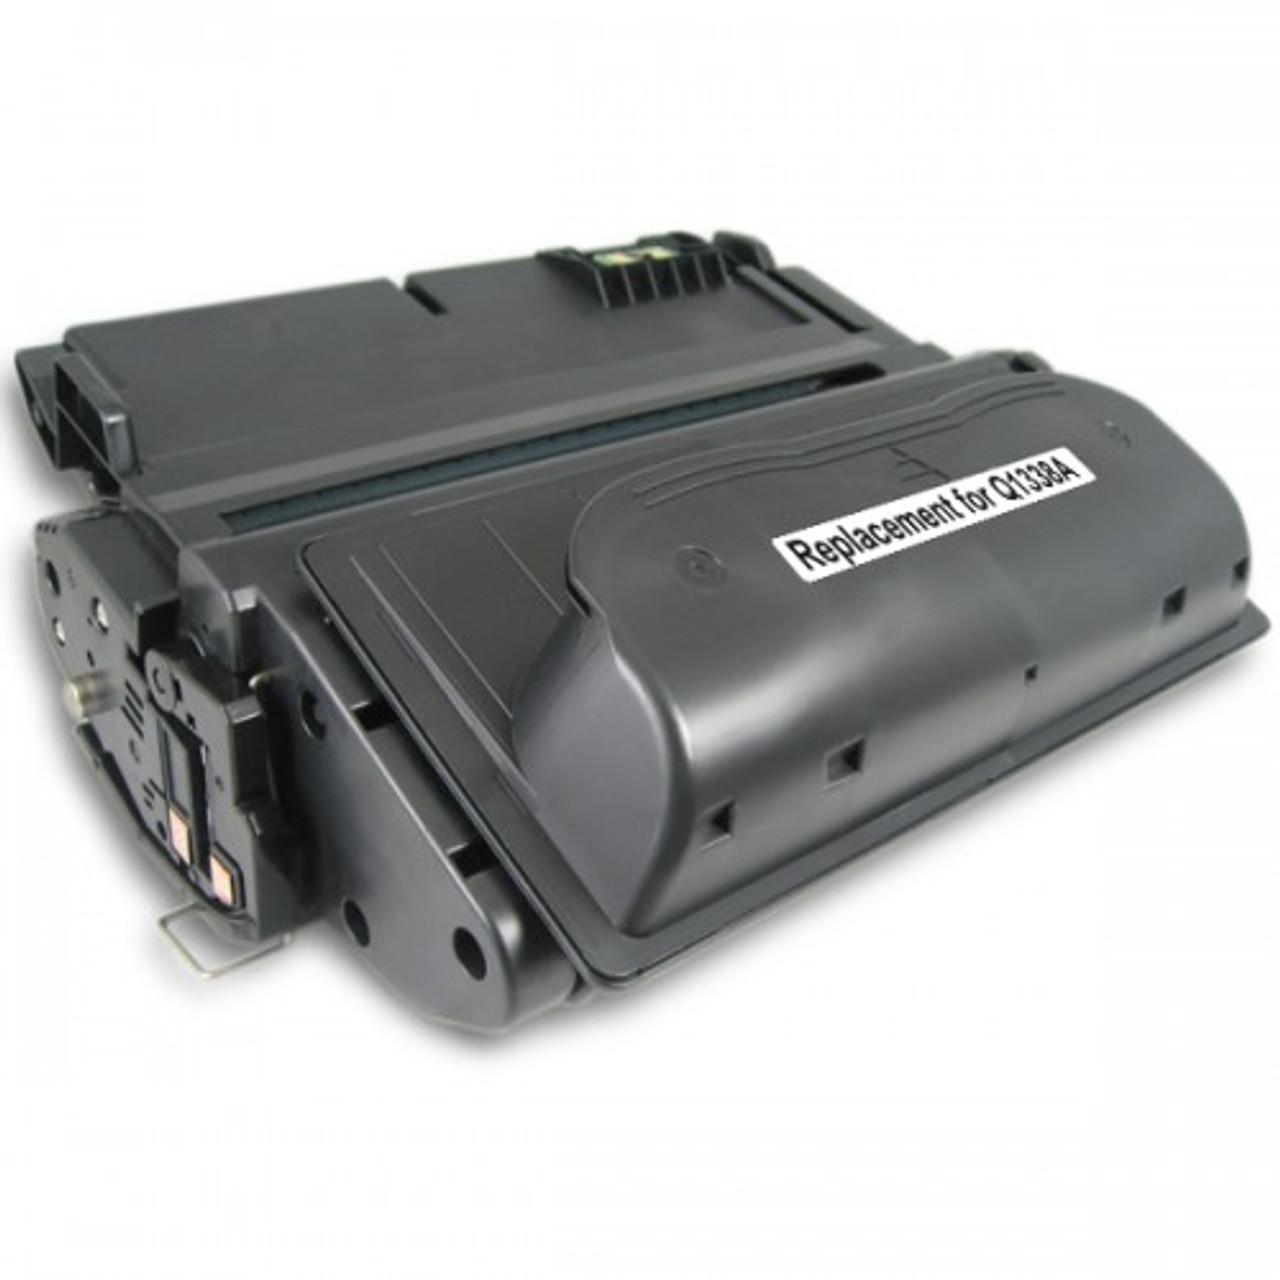 HP 4200 Toner Cartridge - New compatible